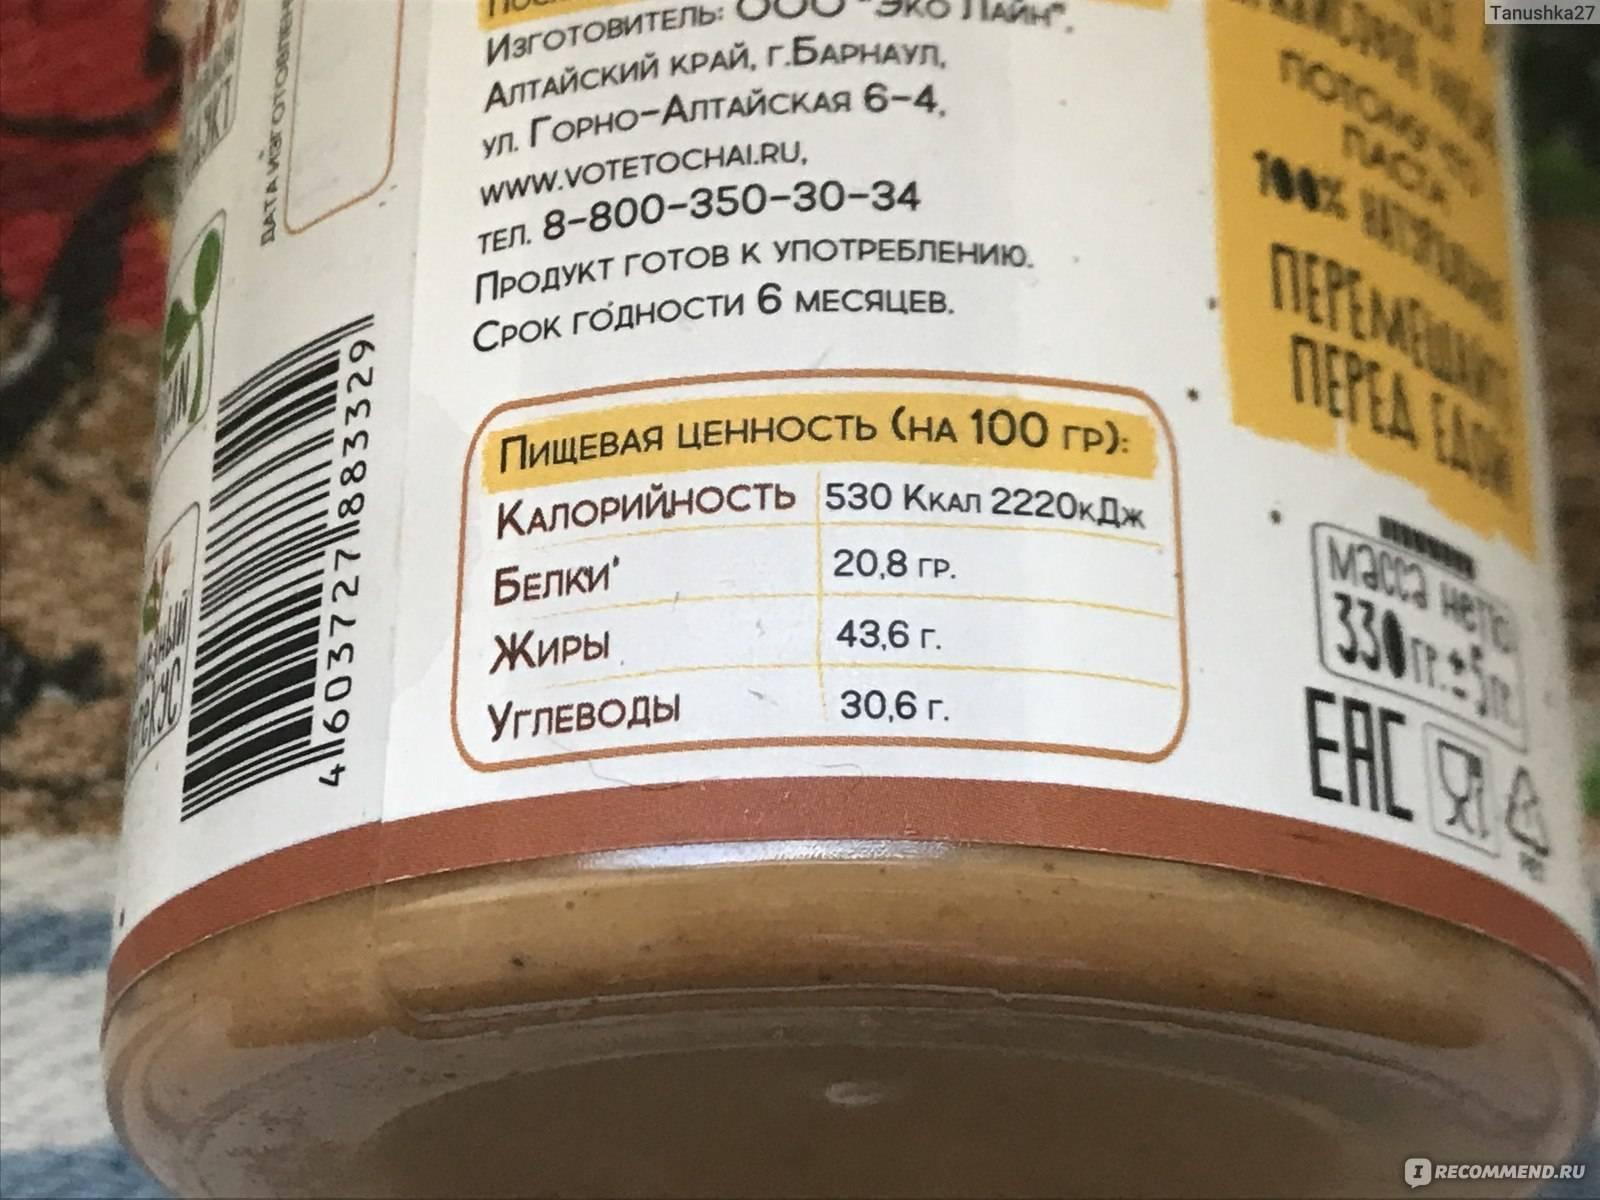 Арахисовая паста в домашних условиях: диетический рецепт без сахара, фото и видео